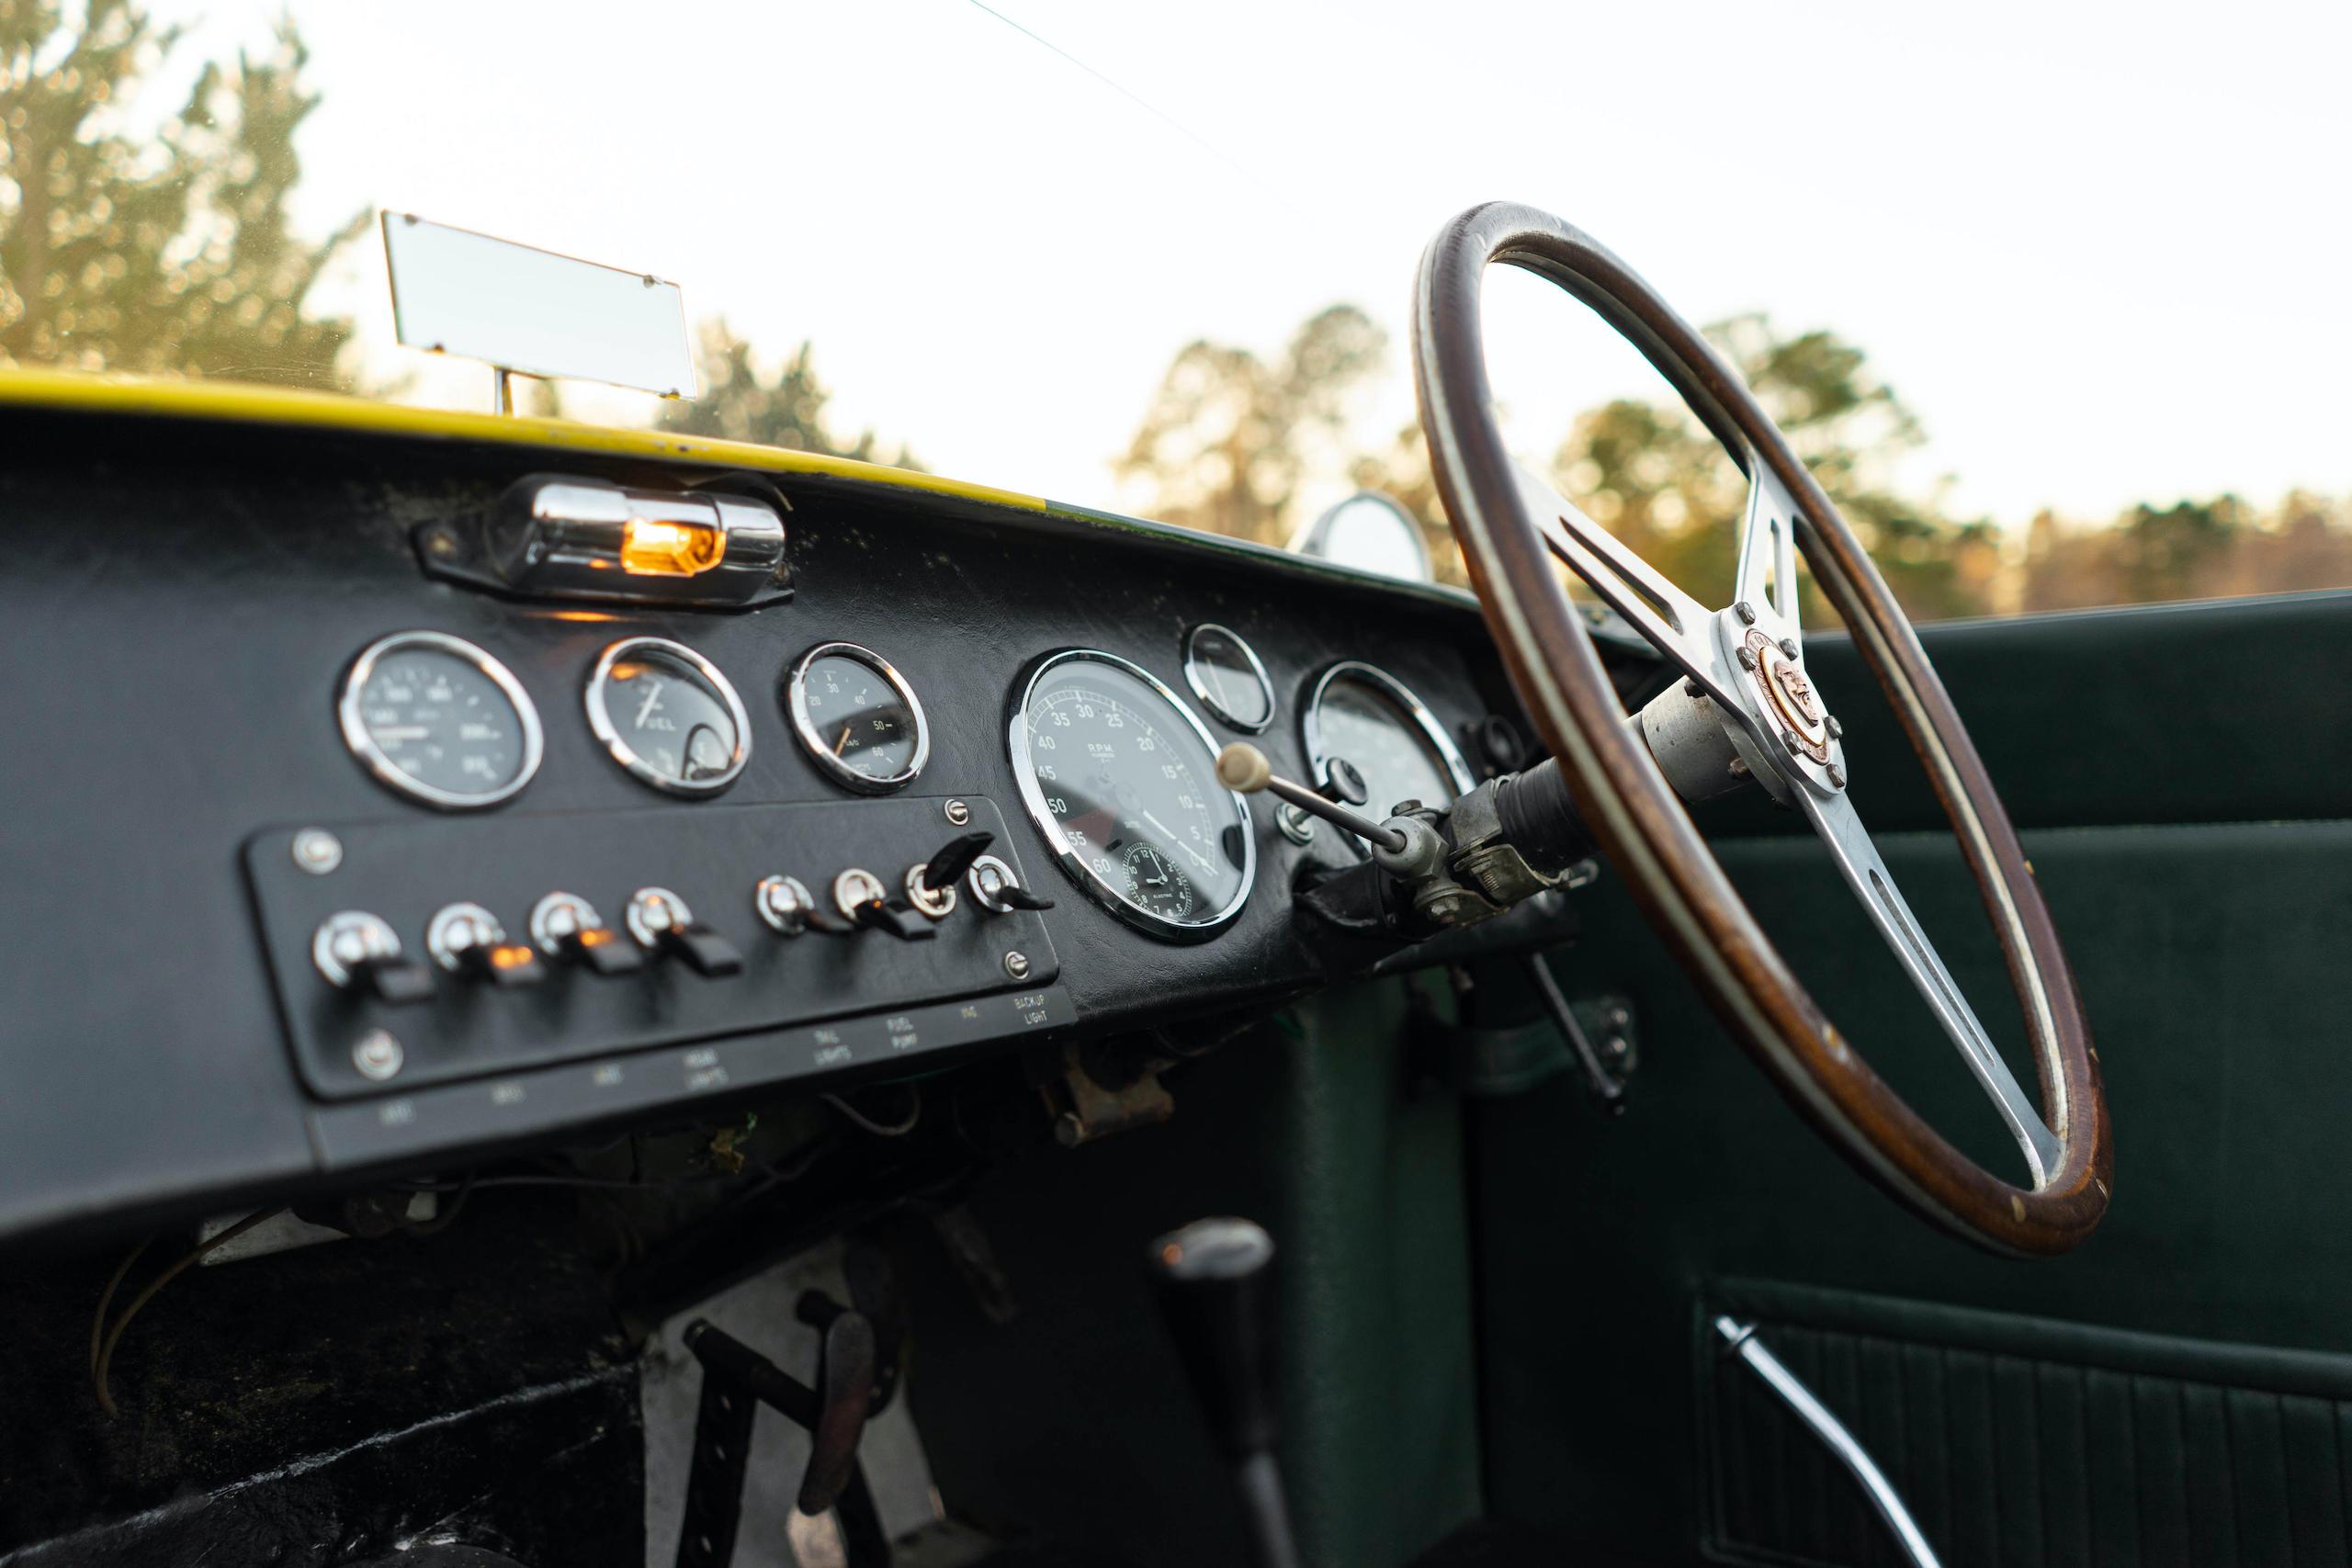 1953 RGS Atalanta interior dash